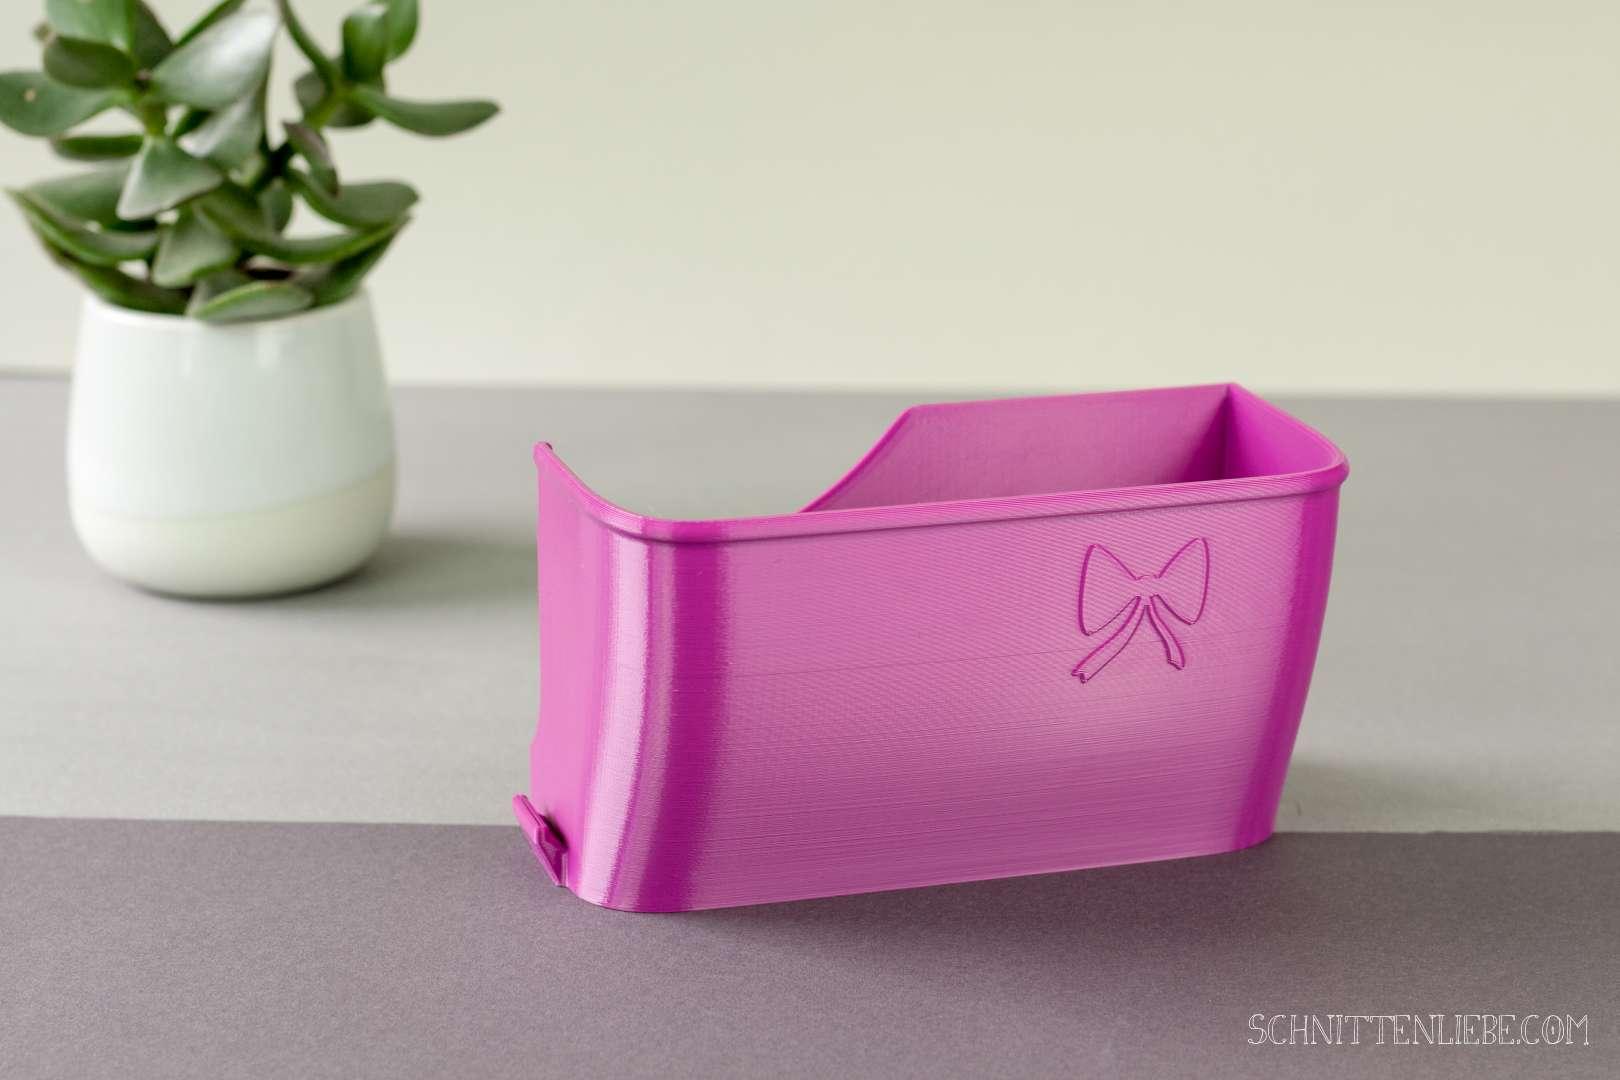 Schnittenliebe 3D Auffangbehälter Gritzner 788 purpur